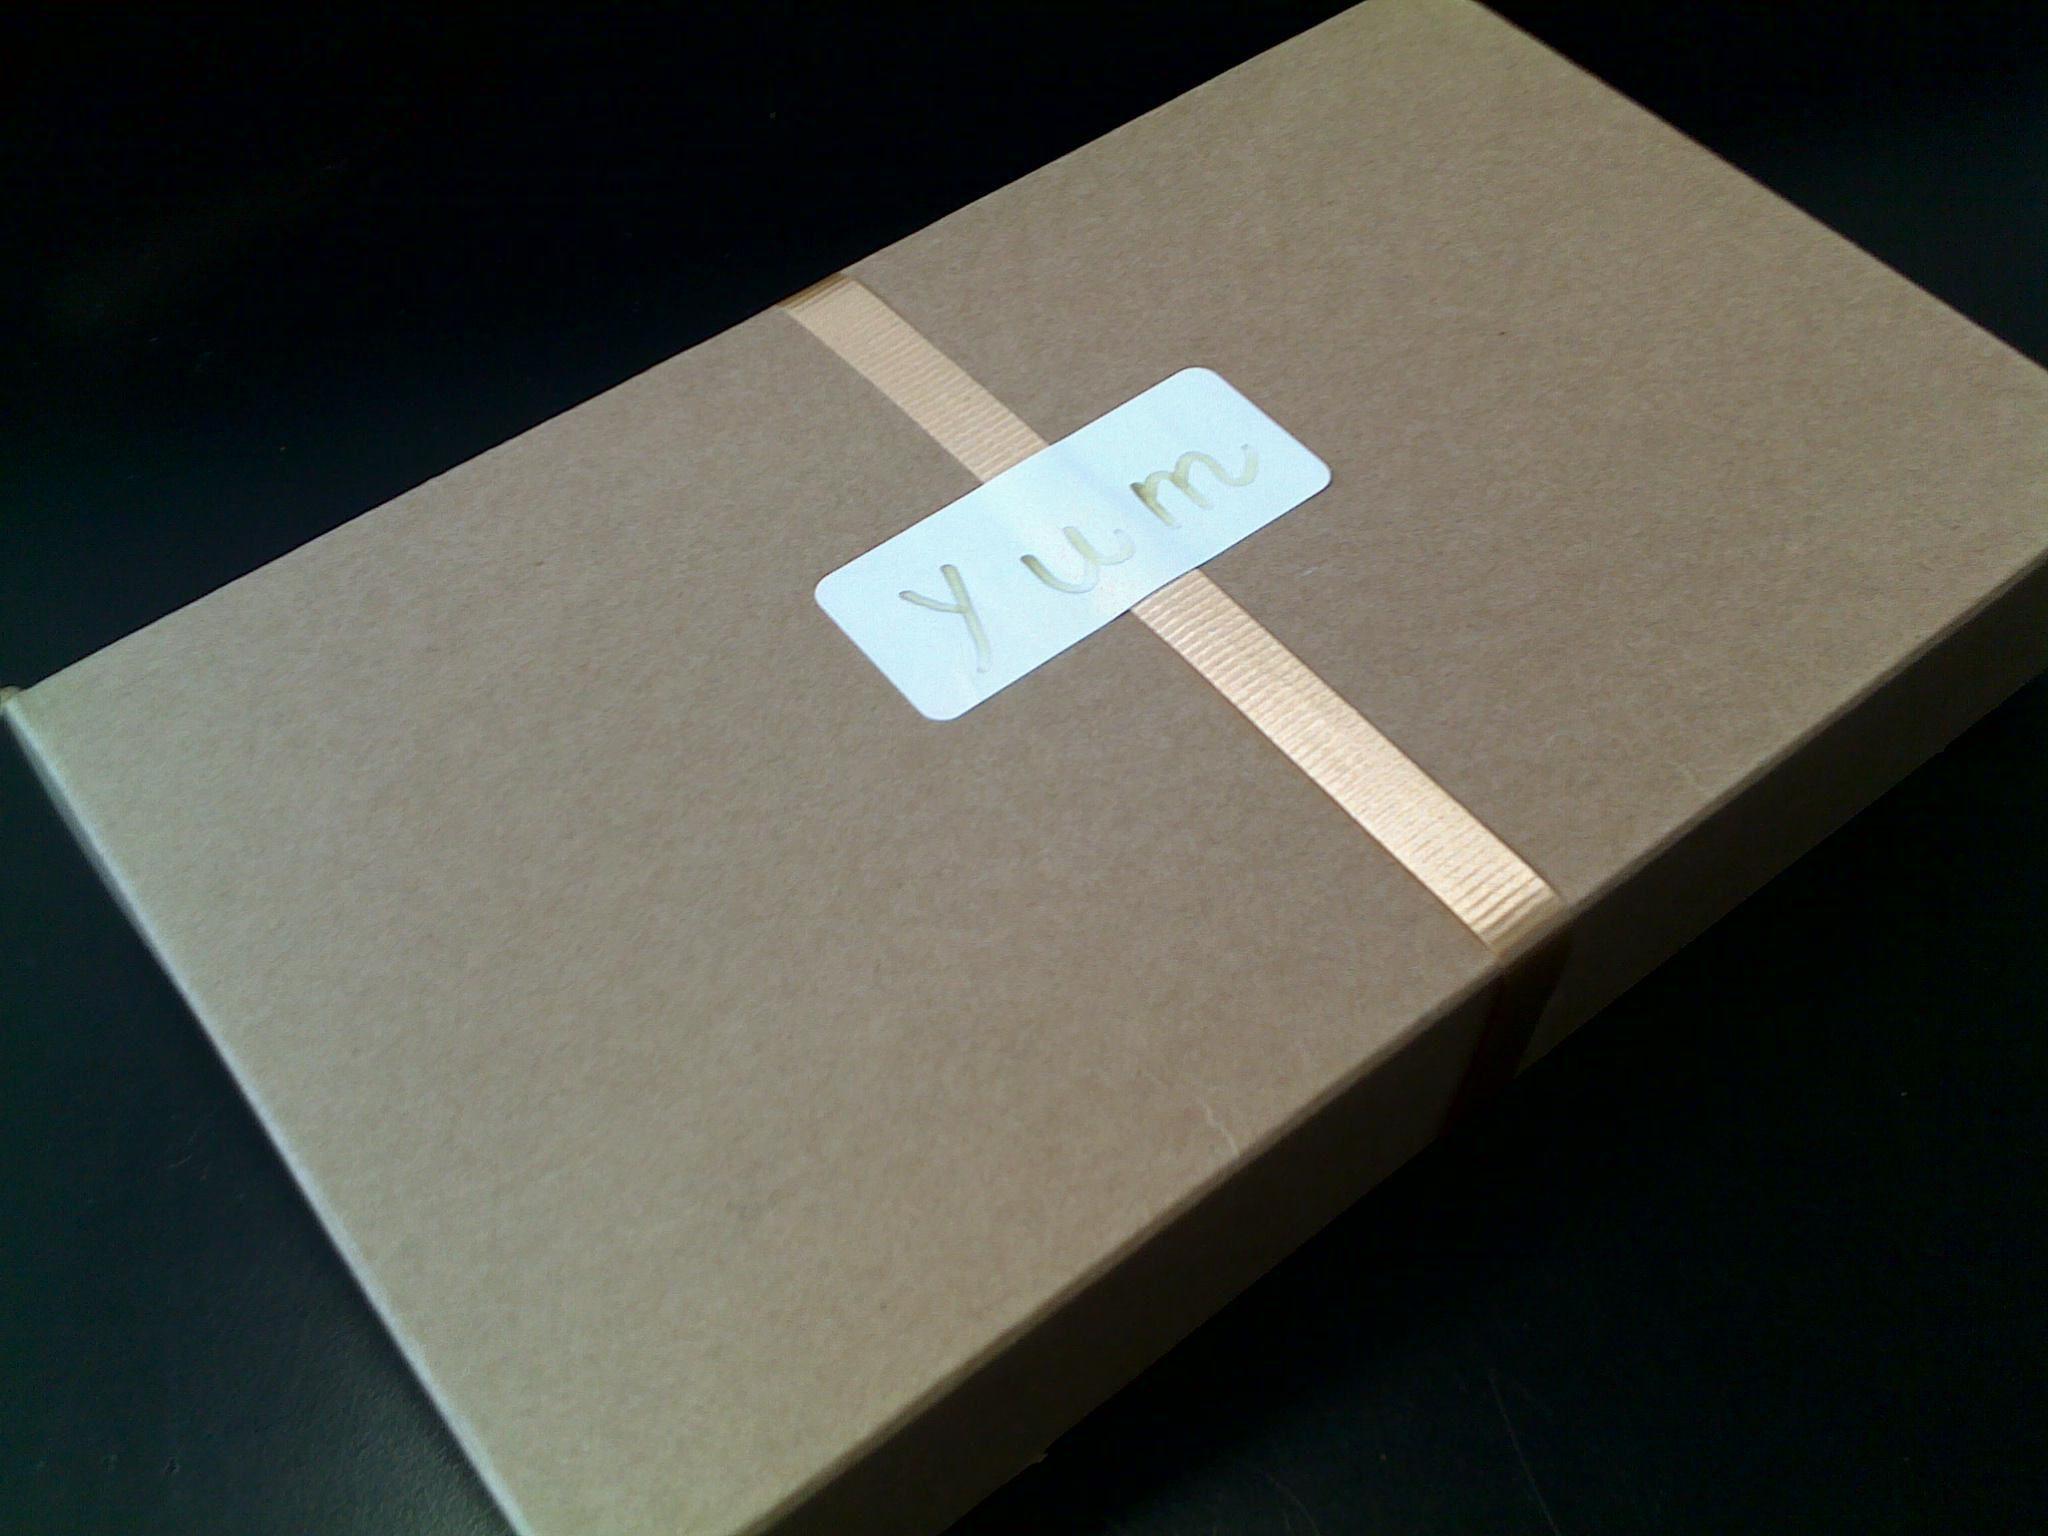 Treat Box Project